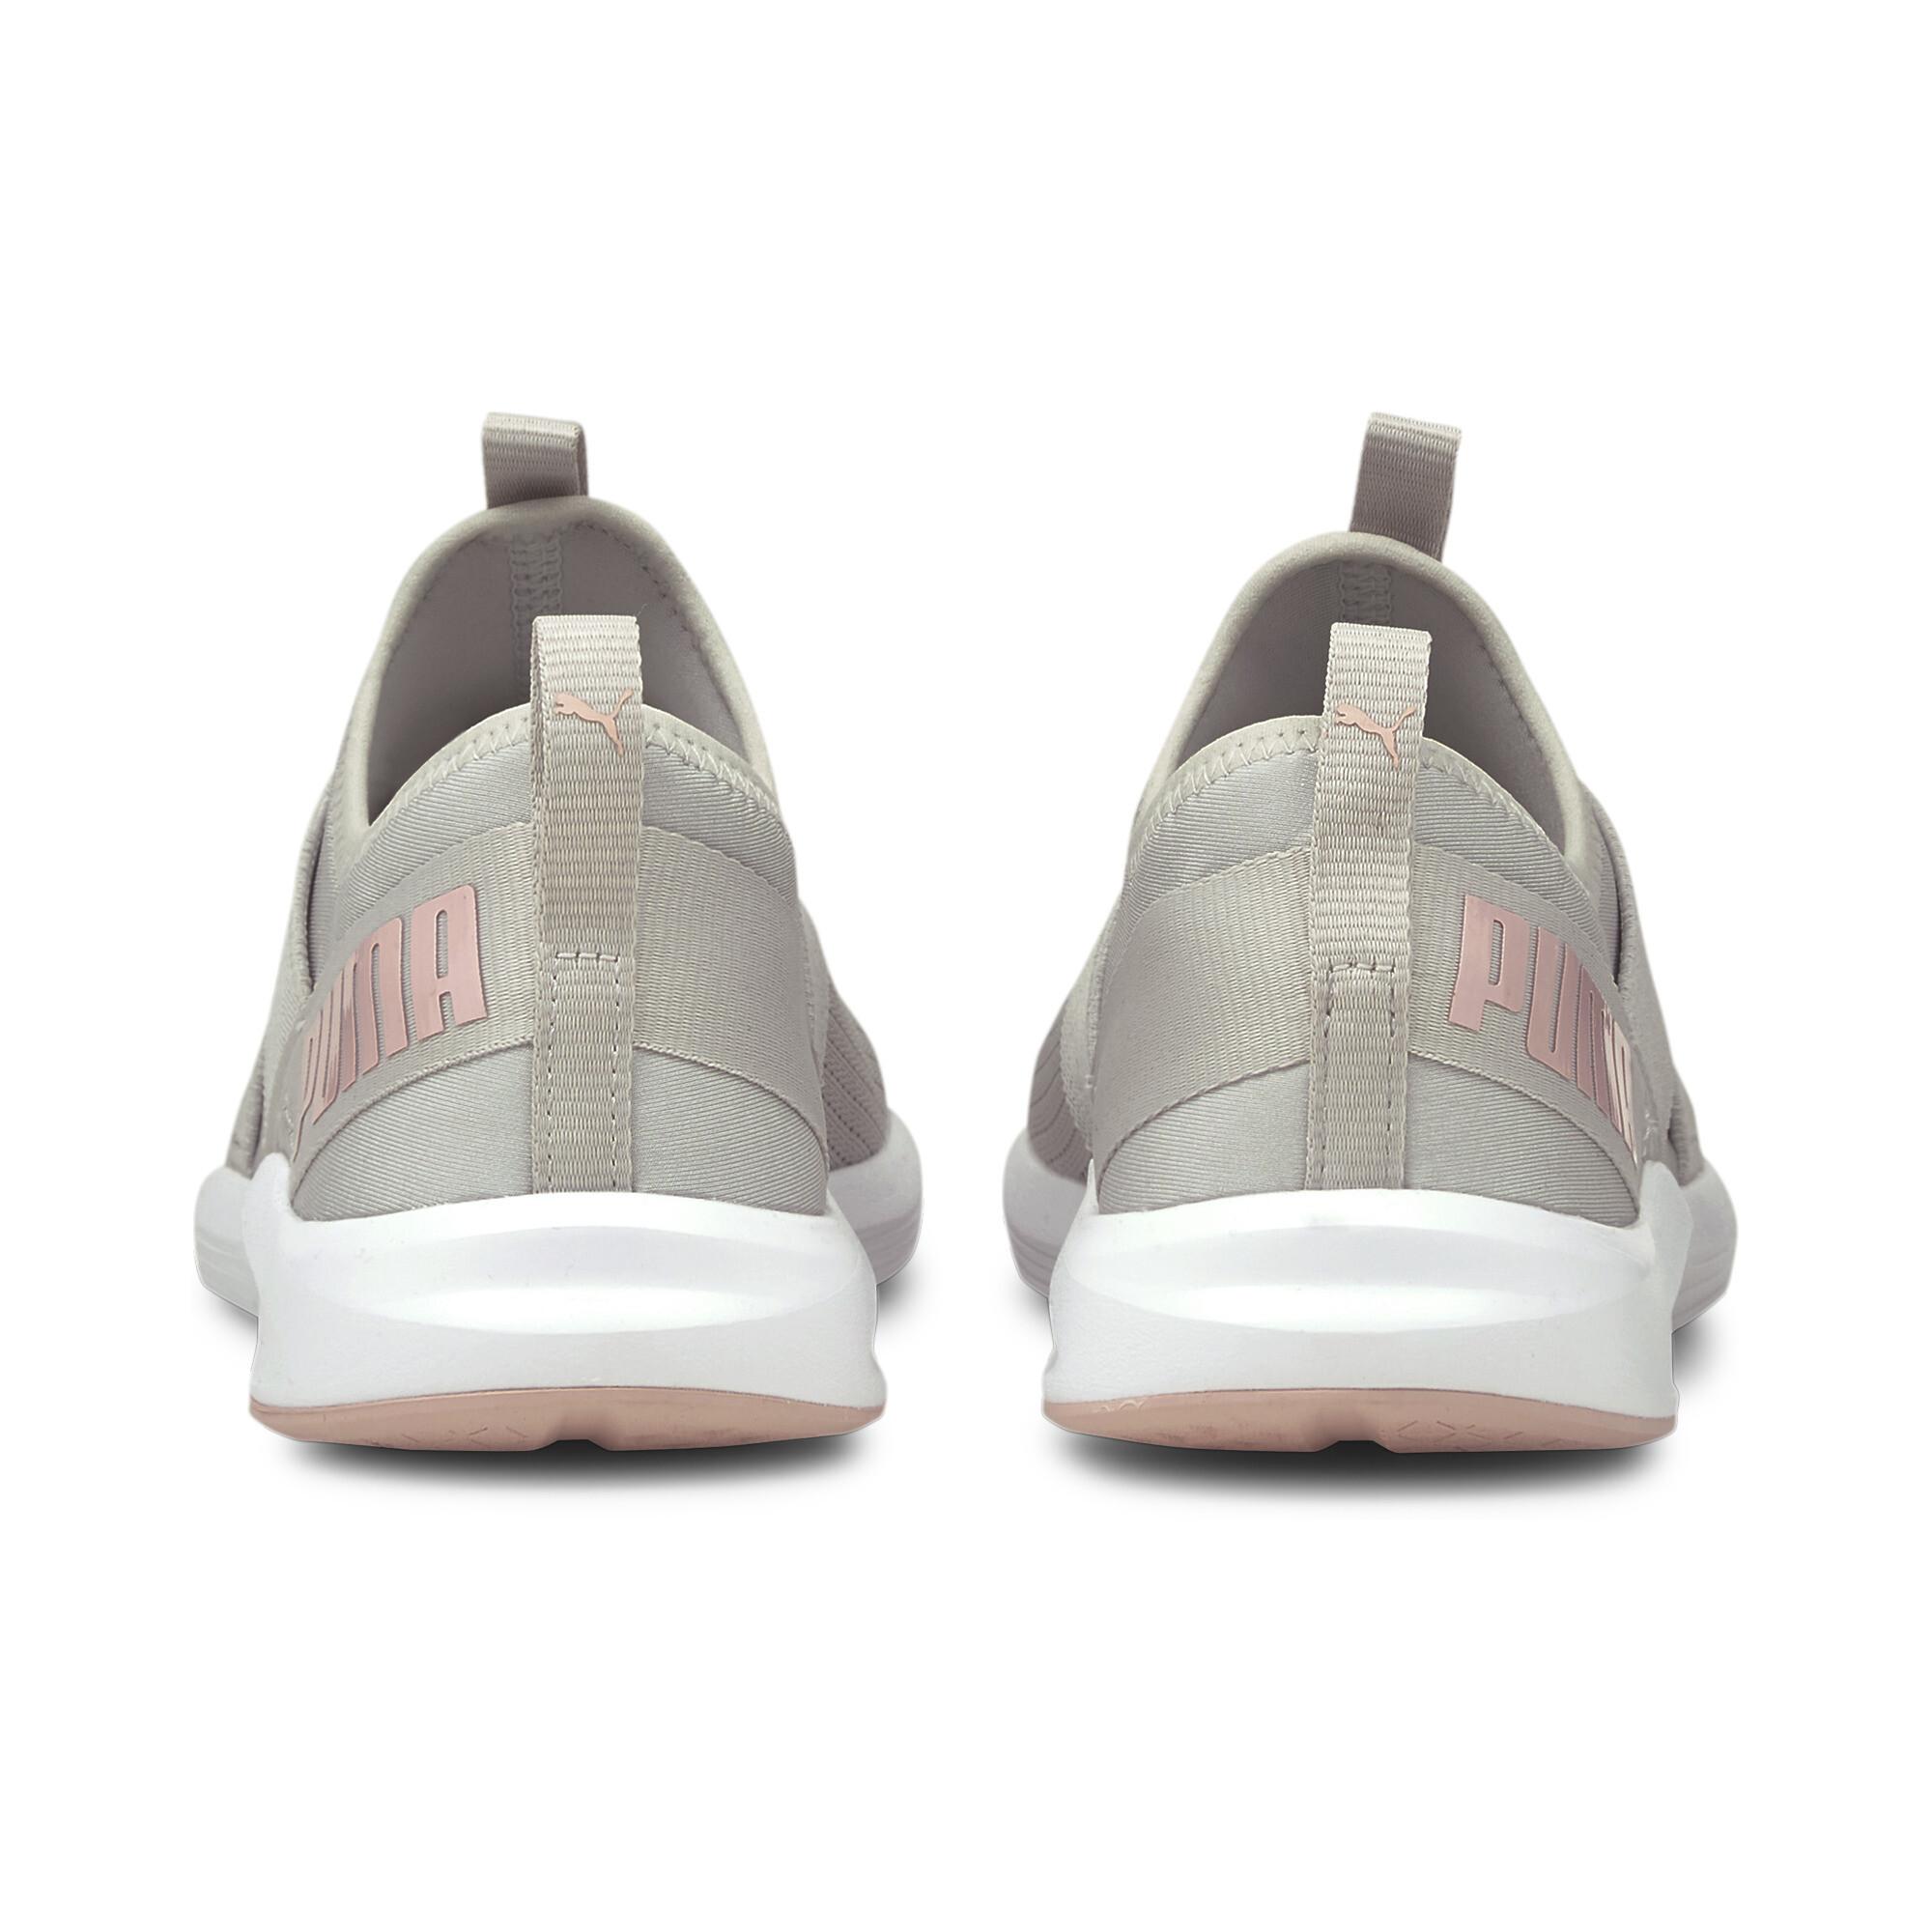 thumbnail 6 - PUMA Women's Prowl Slip On Training Shoes